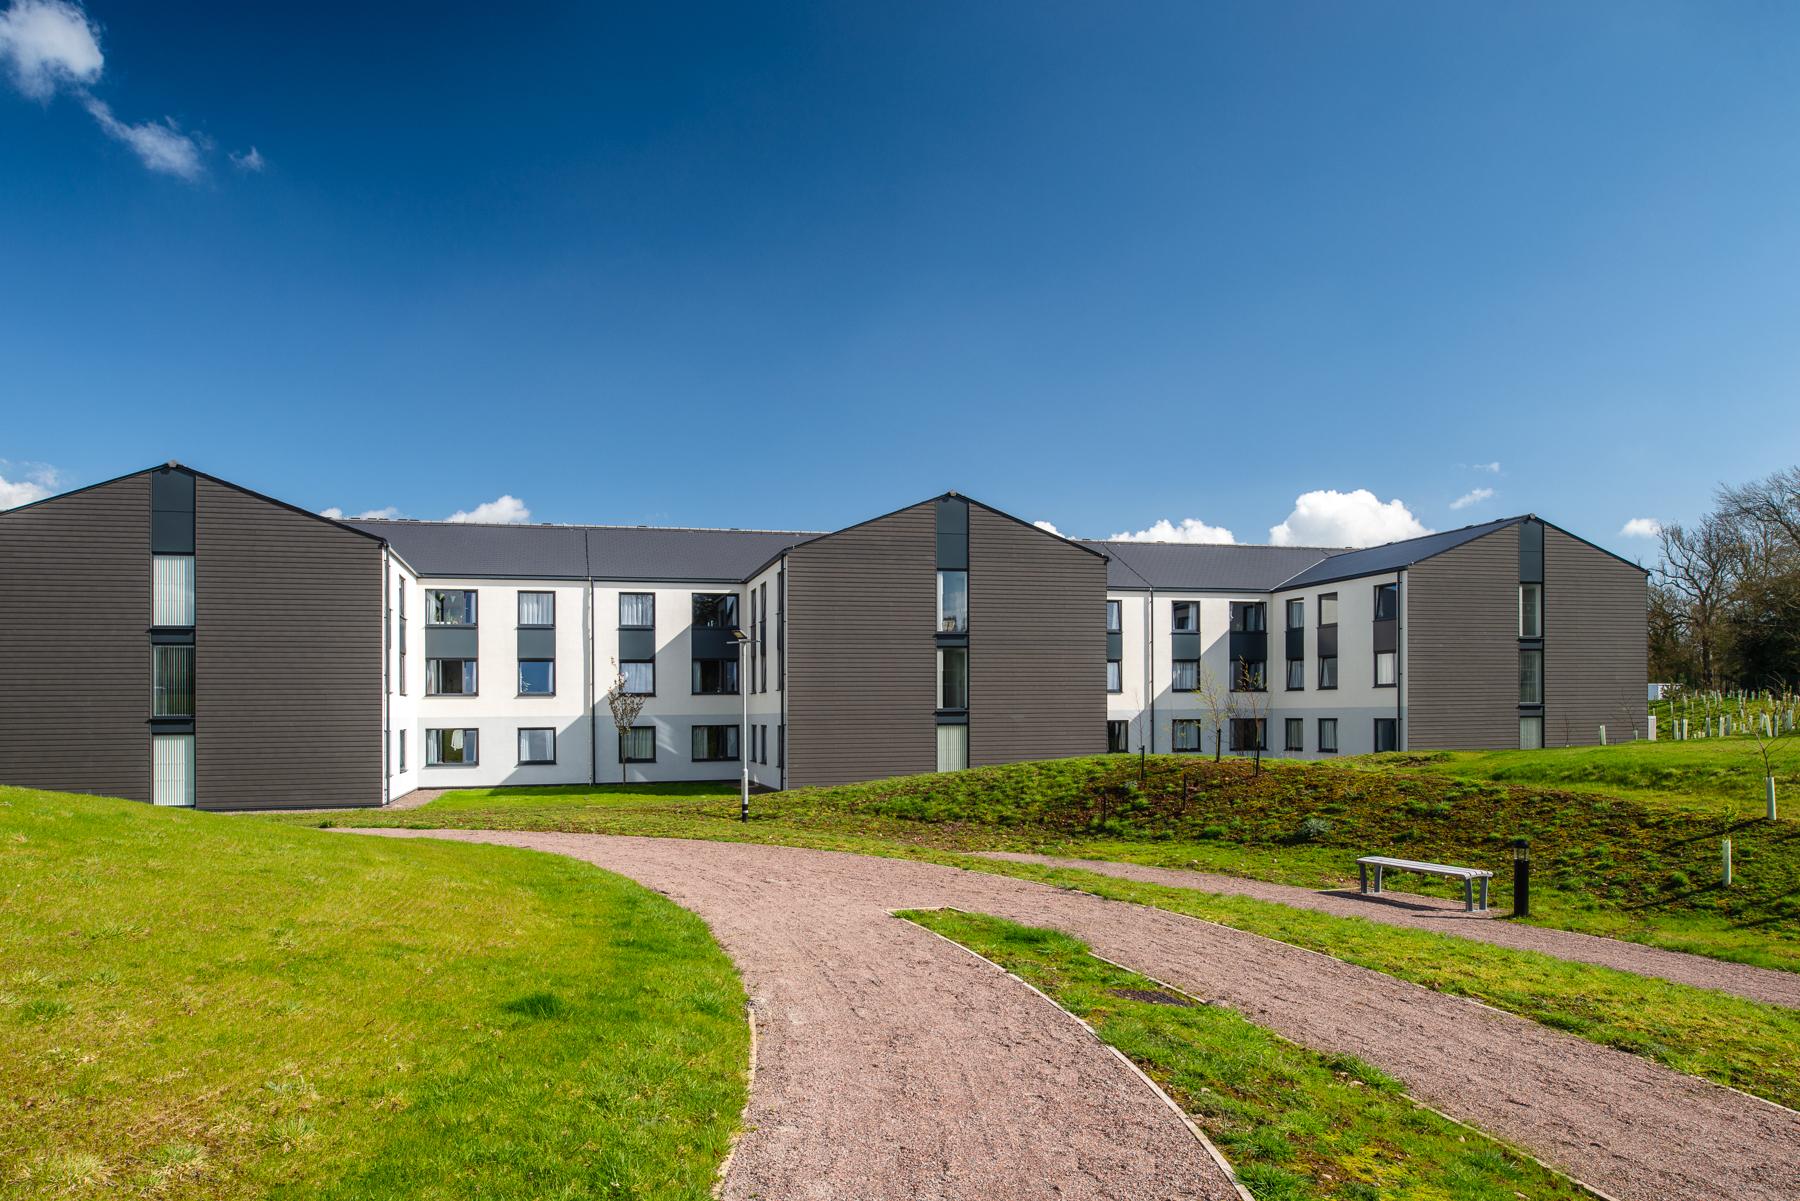 Doctors Accommodation   GWP Architecture   Dumfries, Scotland